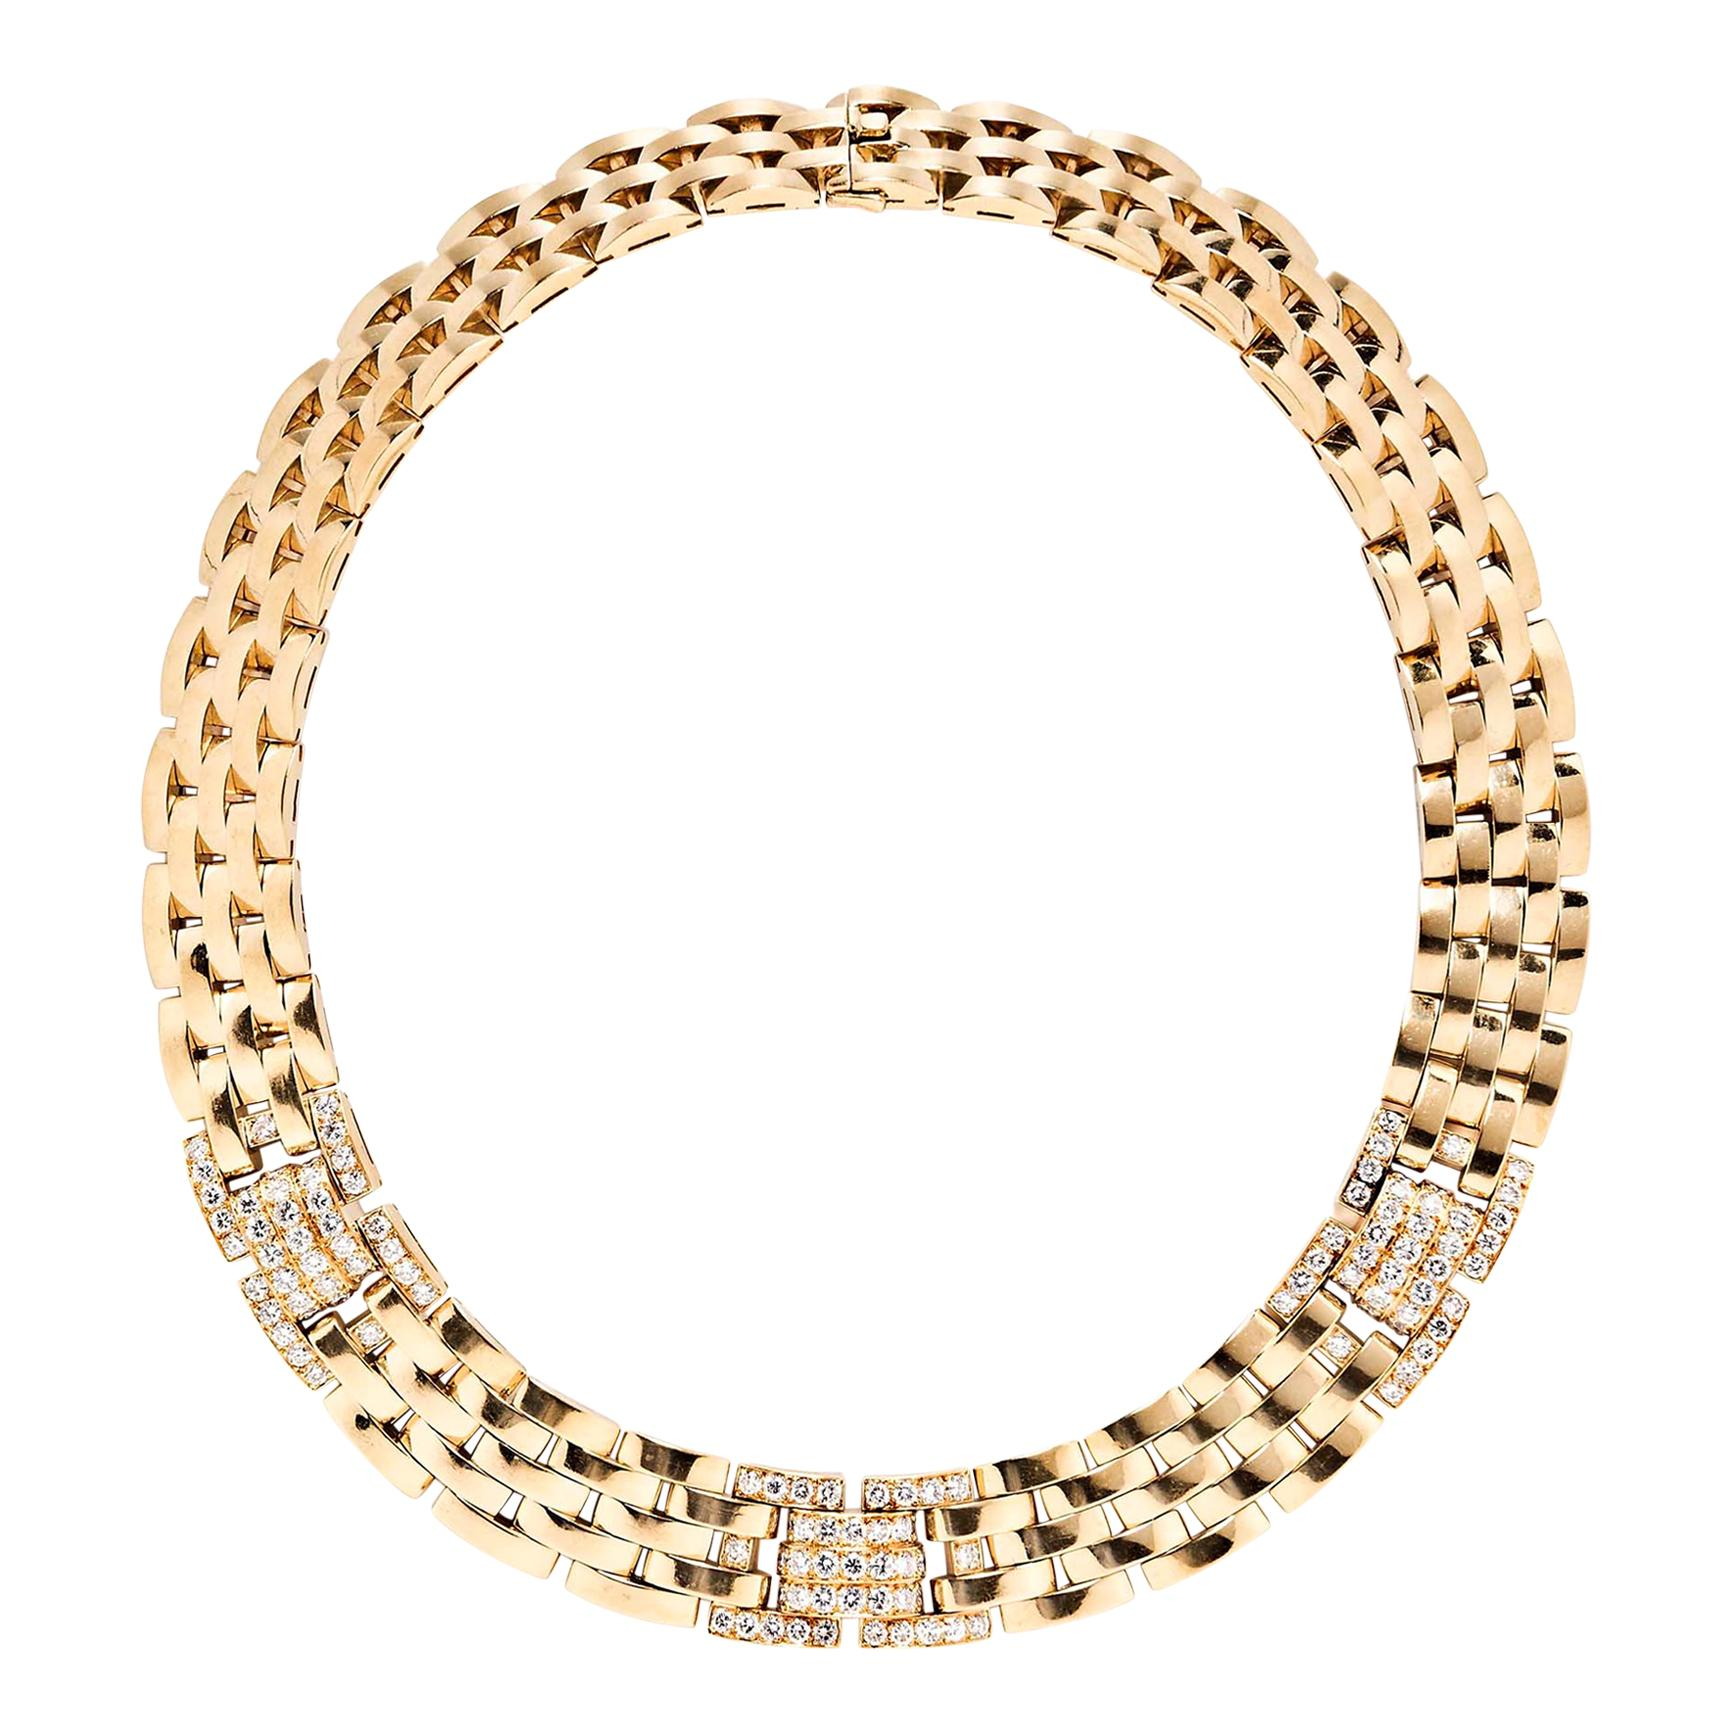 Cartier Maillon Panthère 18 Karat Yellow Gold and Diamond 5 Row Necklace